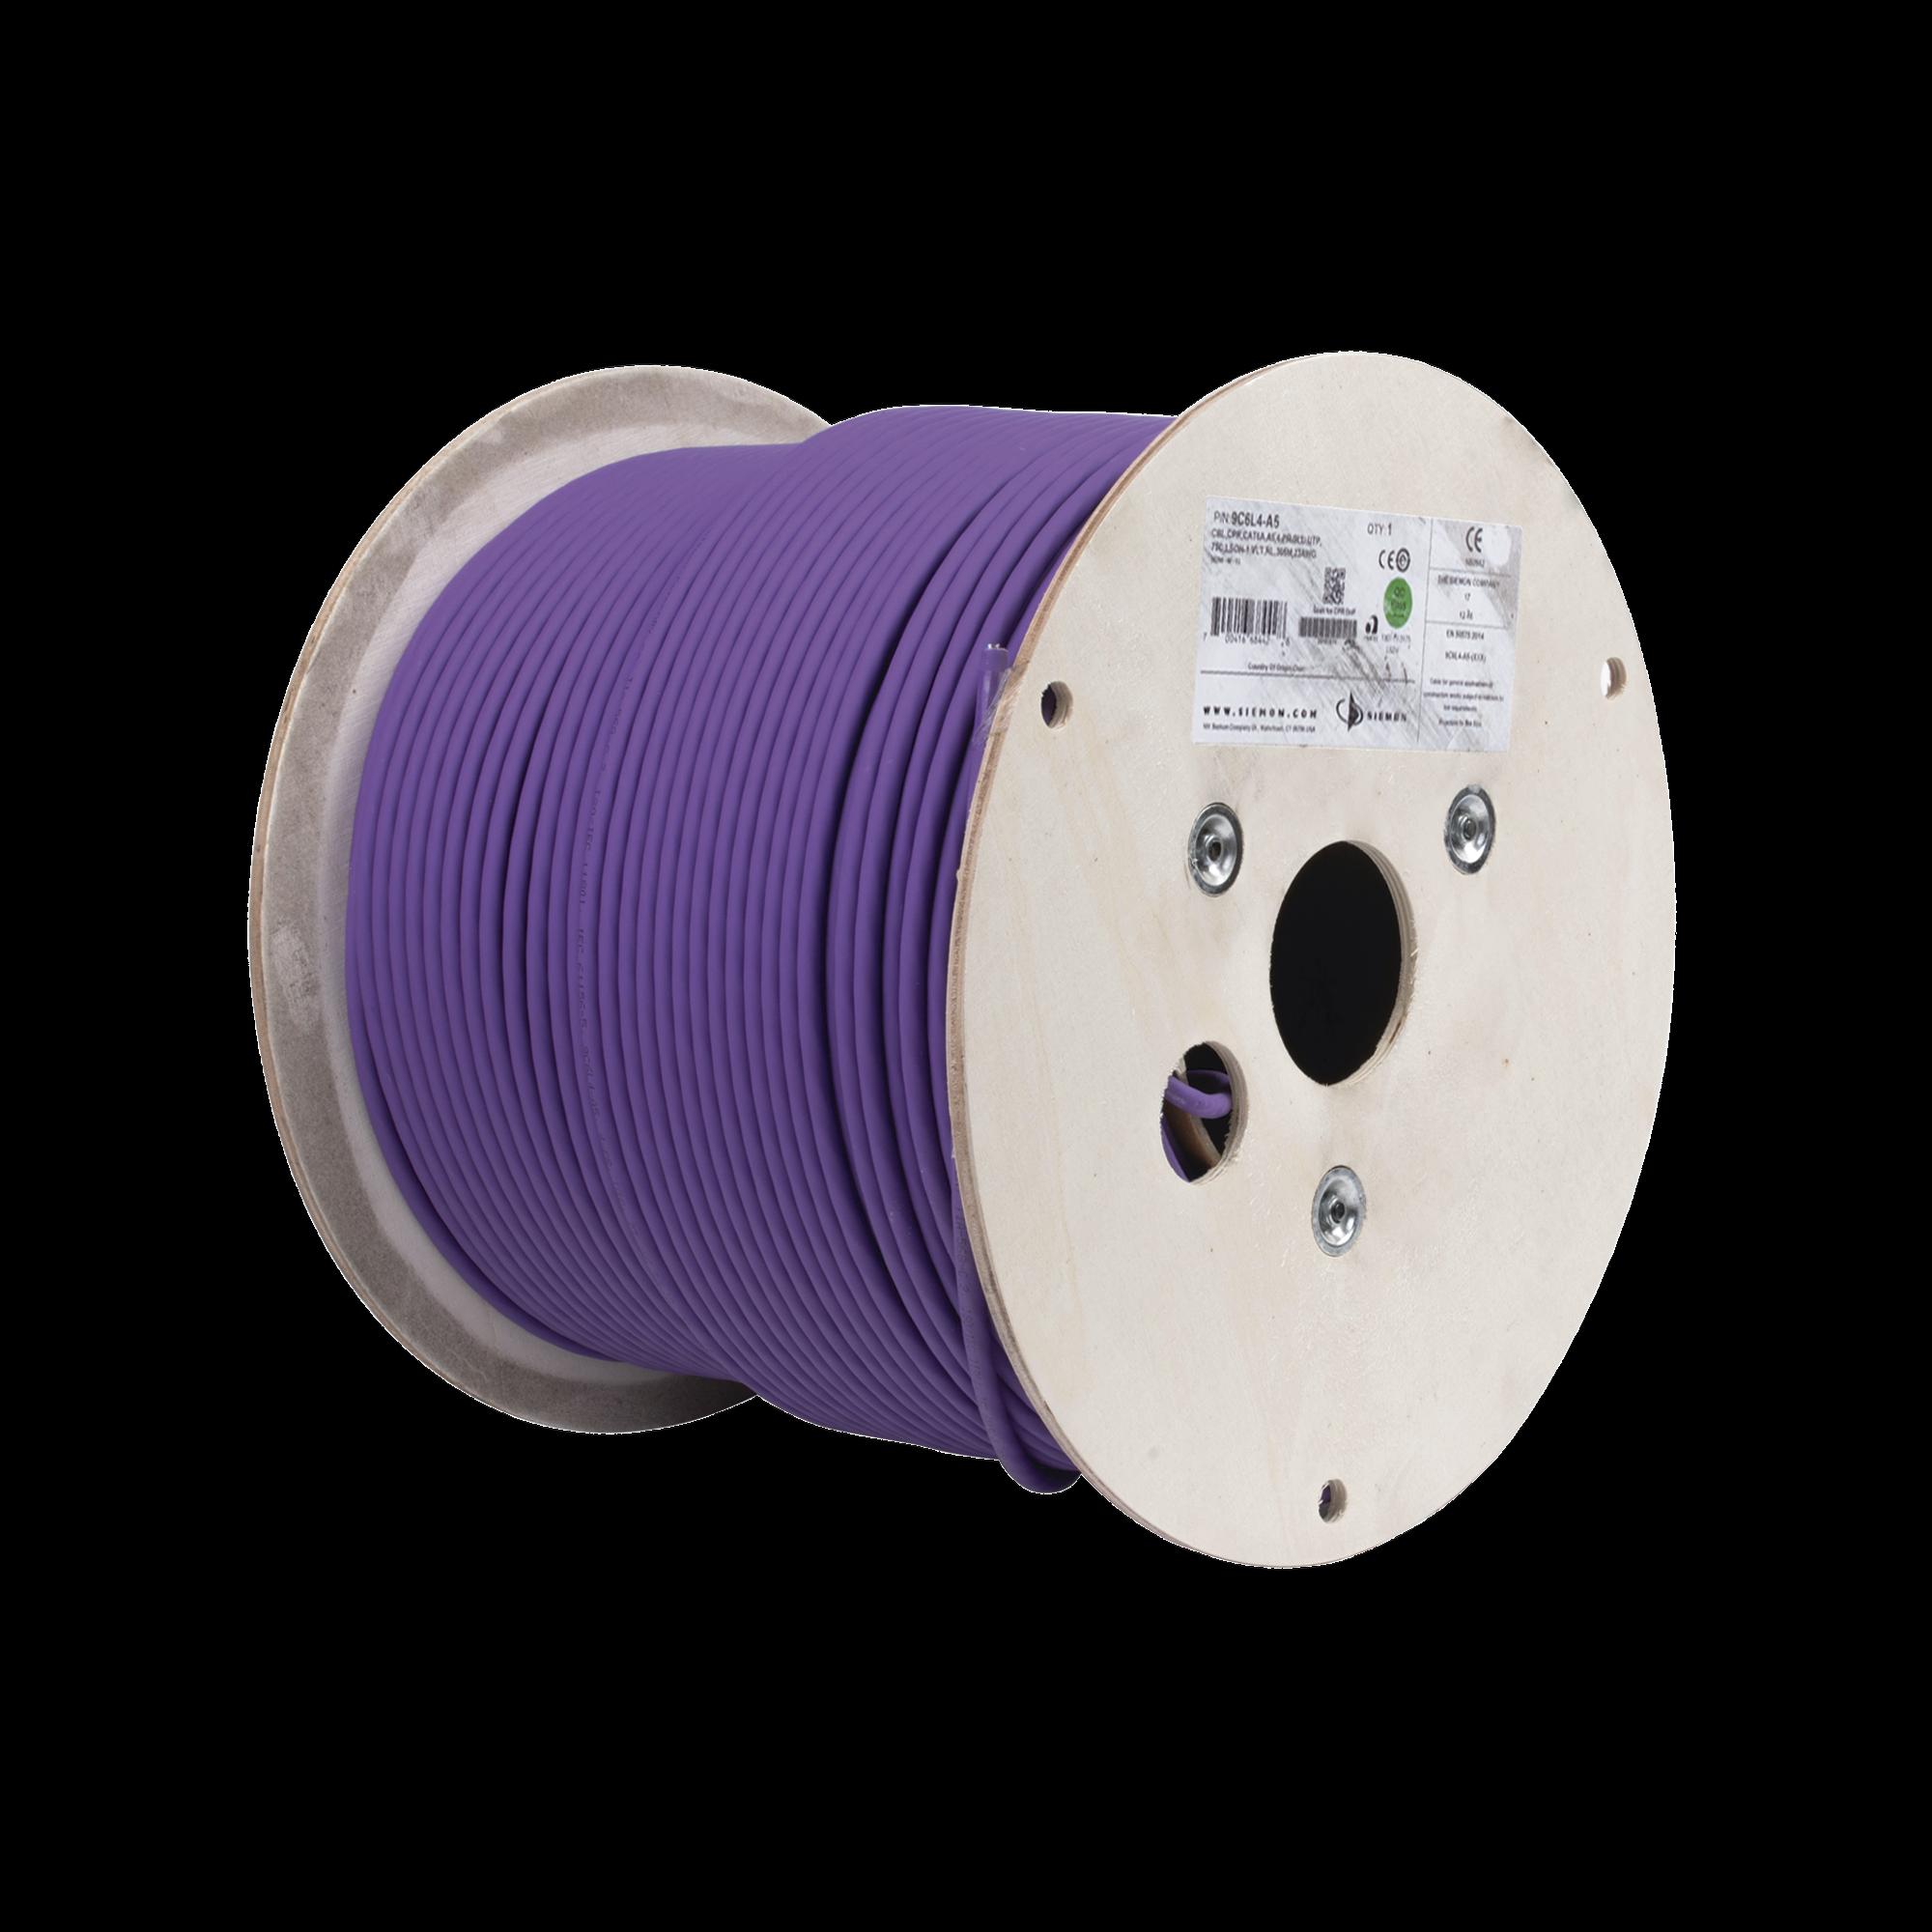 Bobina de Cable U/UTP de 4 pares, Z-MAX, Cat6A, Soporte de Aplicaciones 10GBase-T, LS0H, Color Violeta, 305m